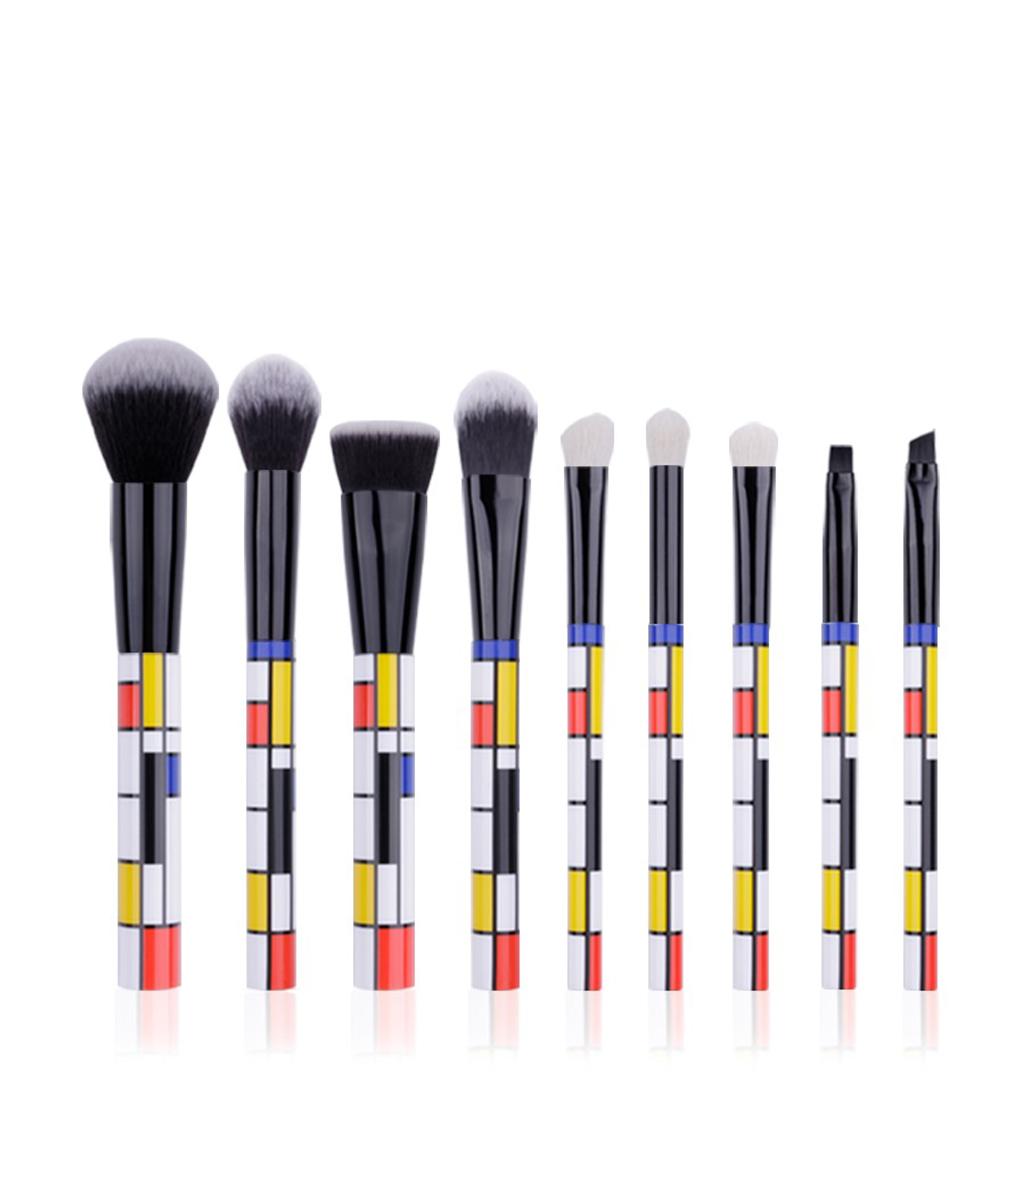 Professional Makeup Brushes || Best Make-Up Brush Set